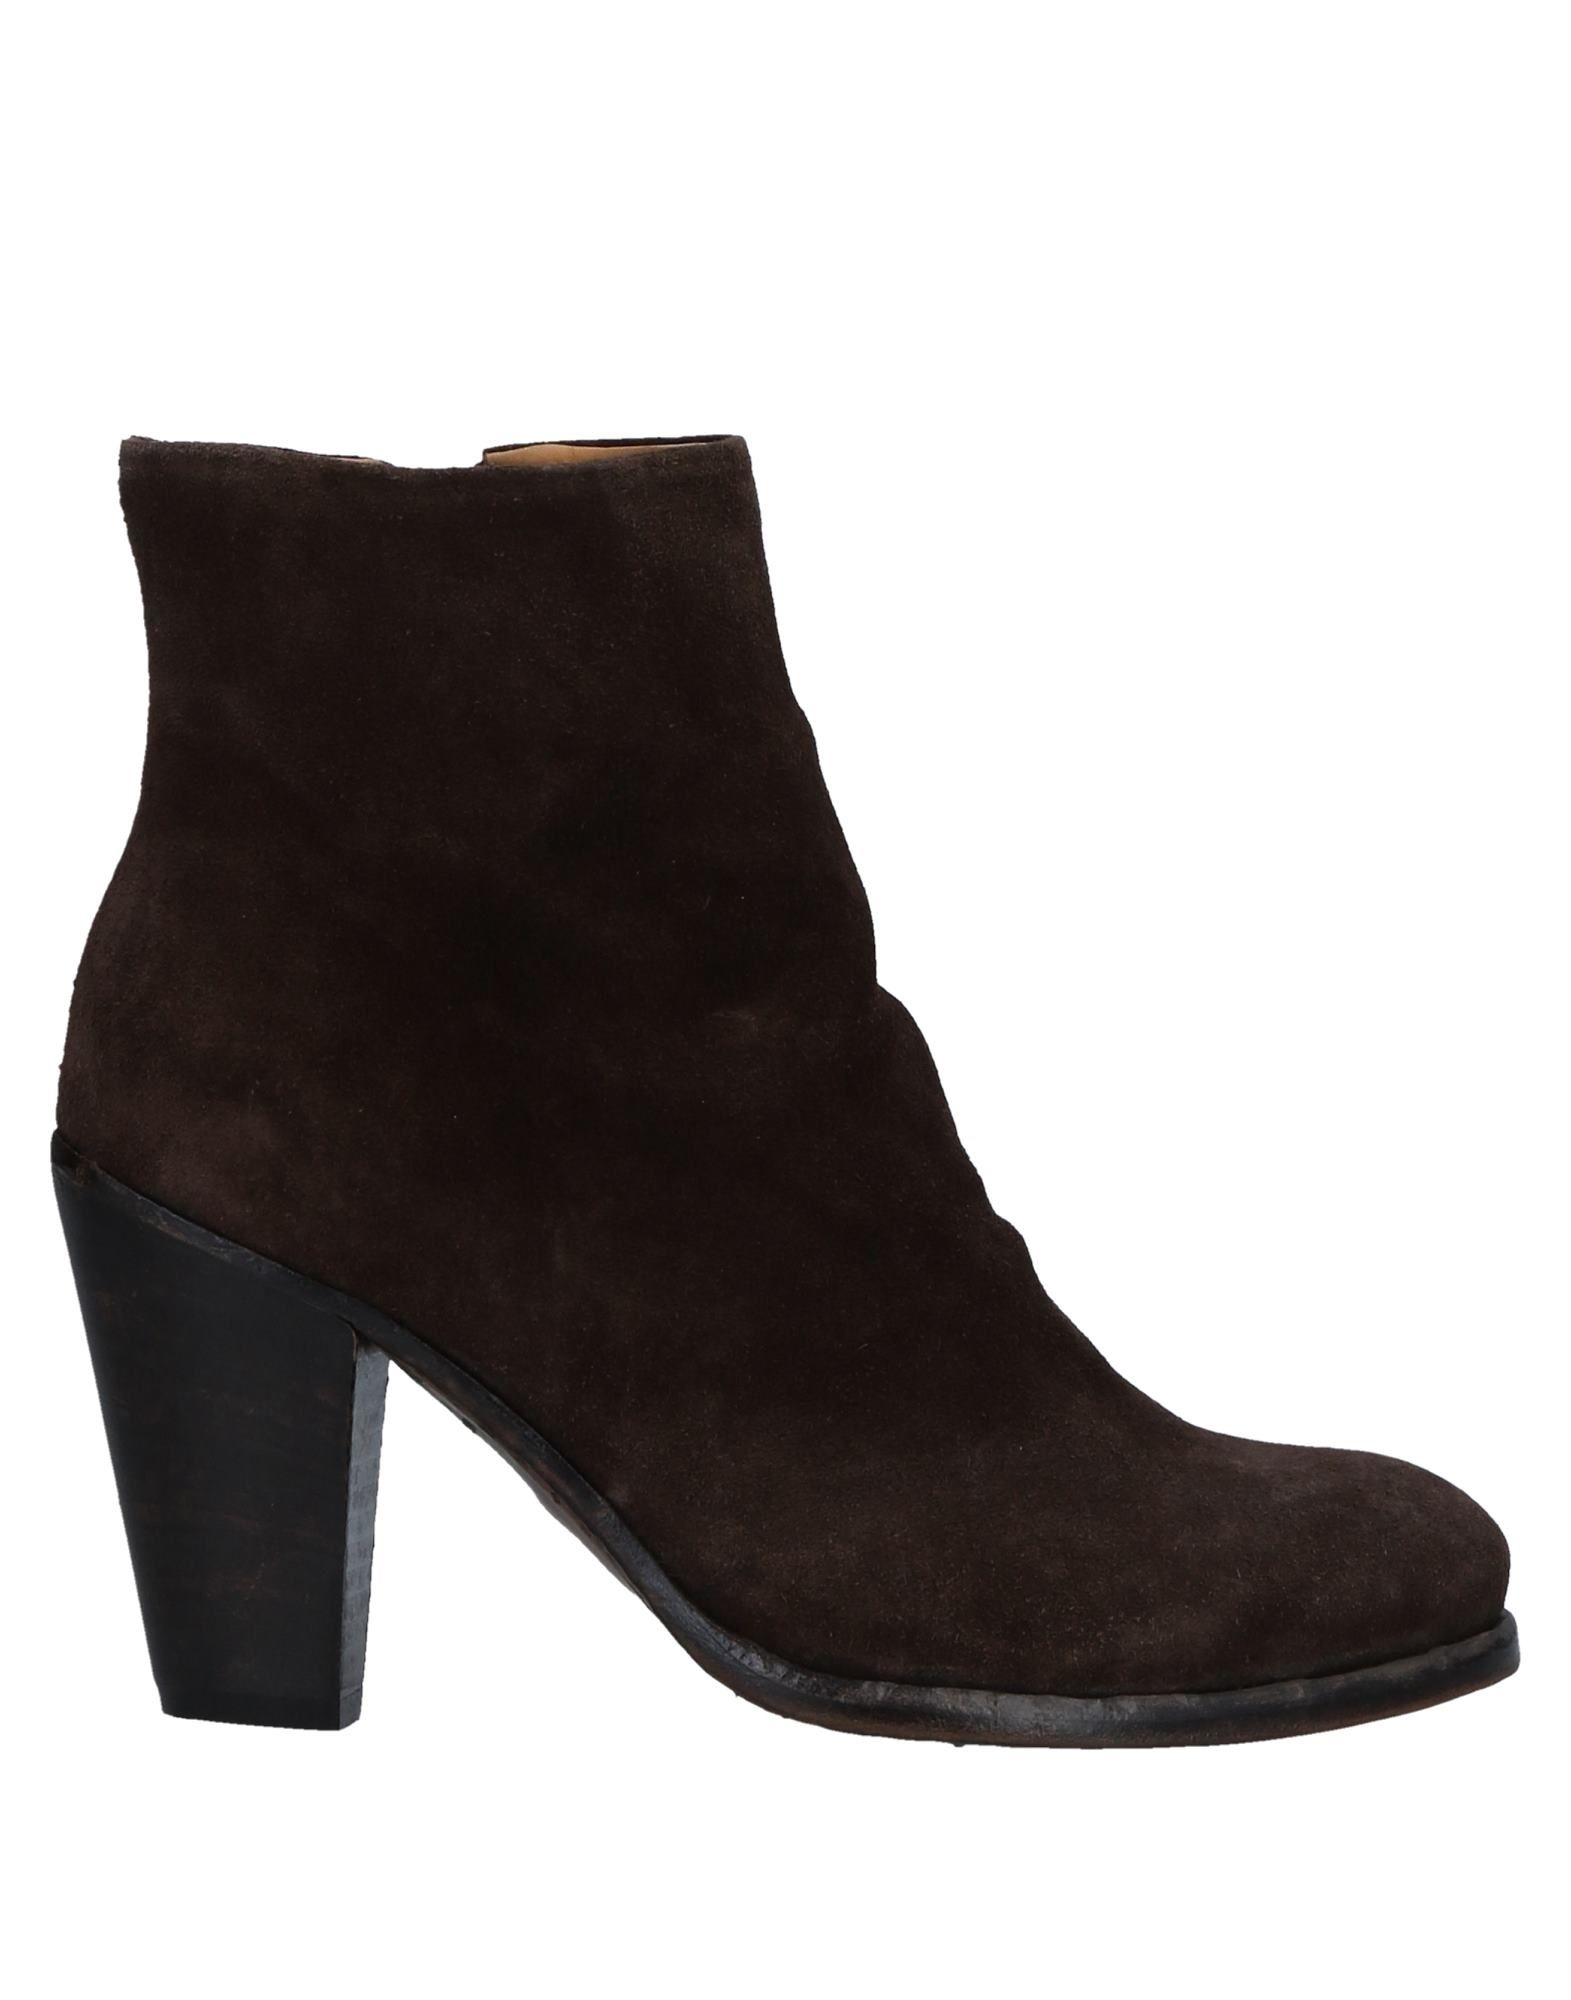 Officine Creative Italia Stiefelette aussehende Damen  11517177QAGünstige gut aussehende Stiefelette Schuhe 69587d